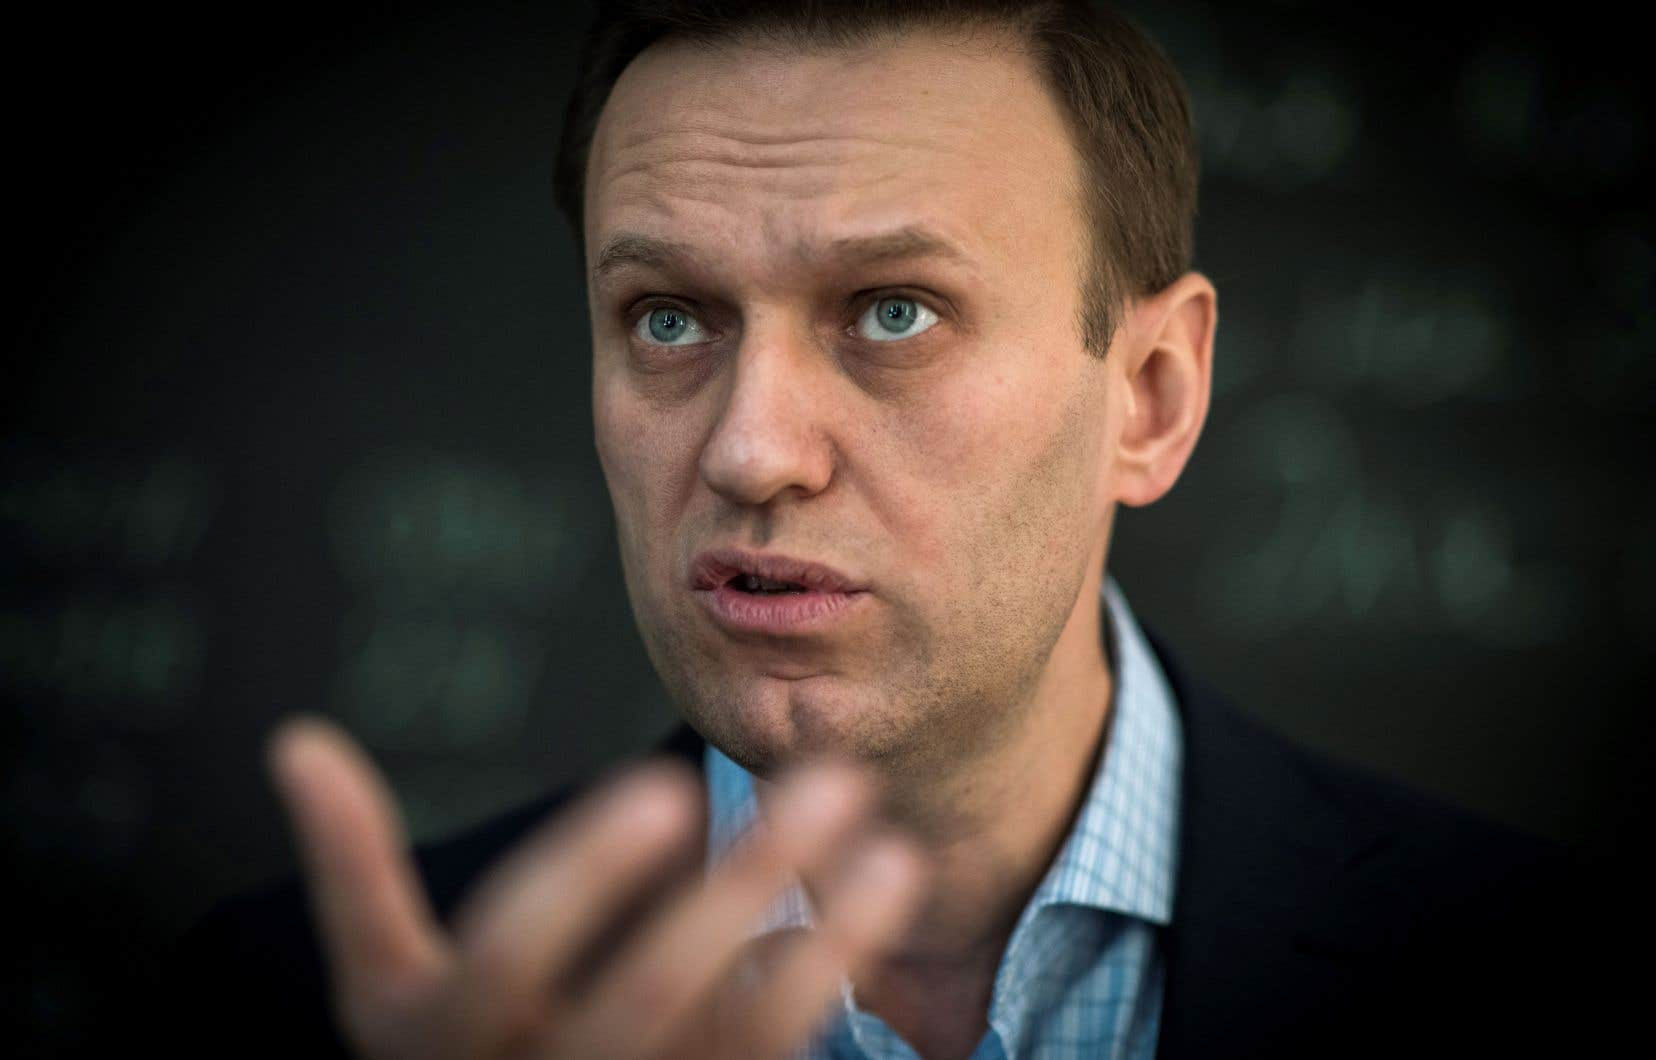 L'opposant russe Alexeï Navalny